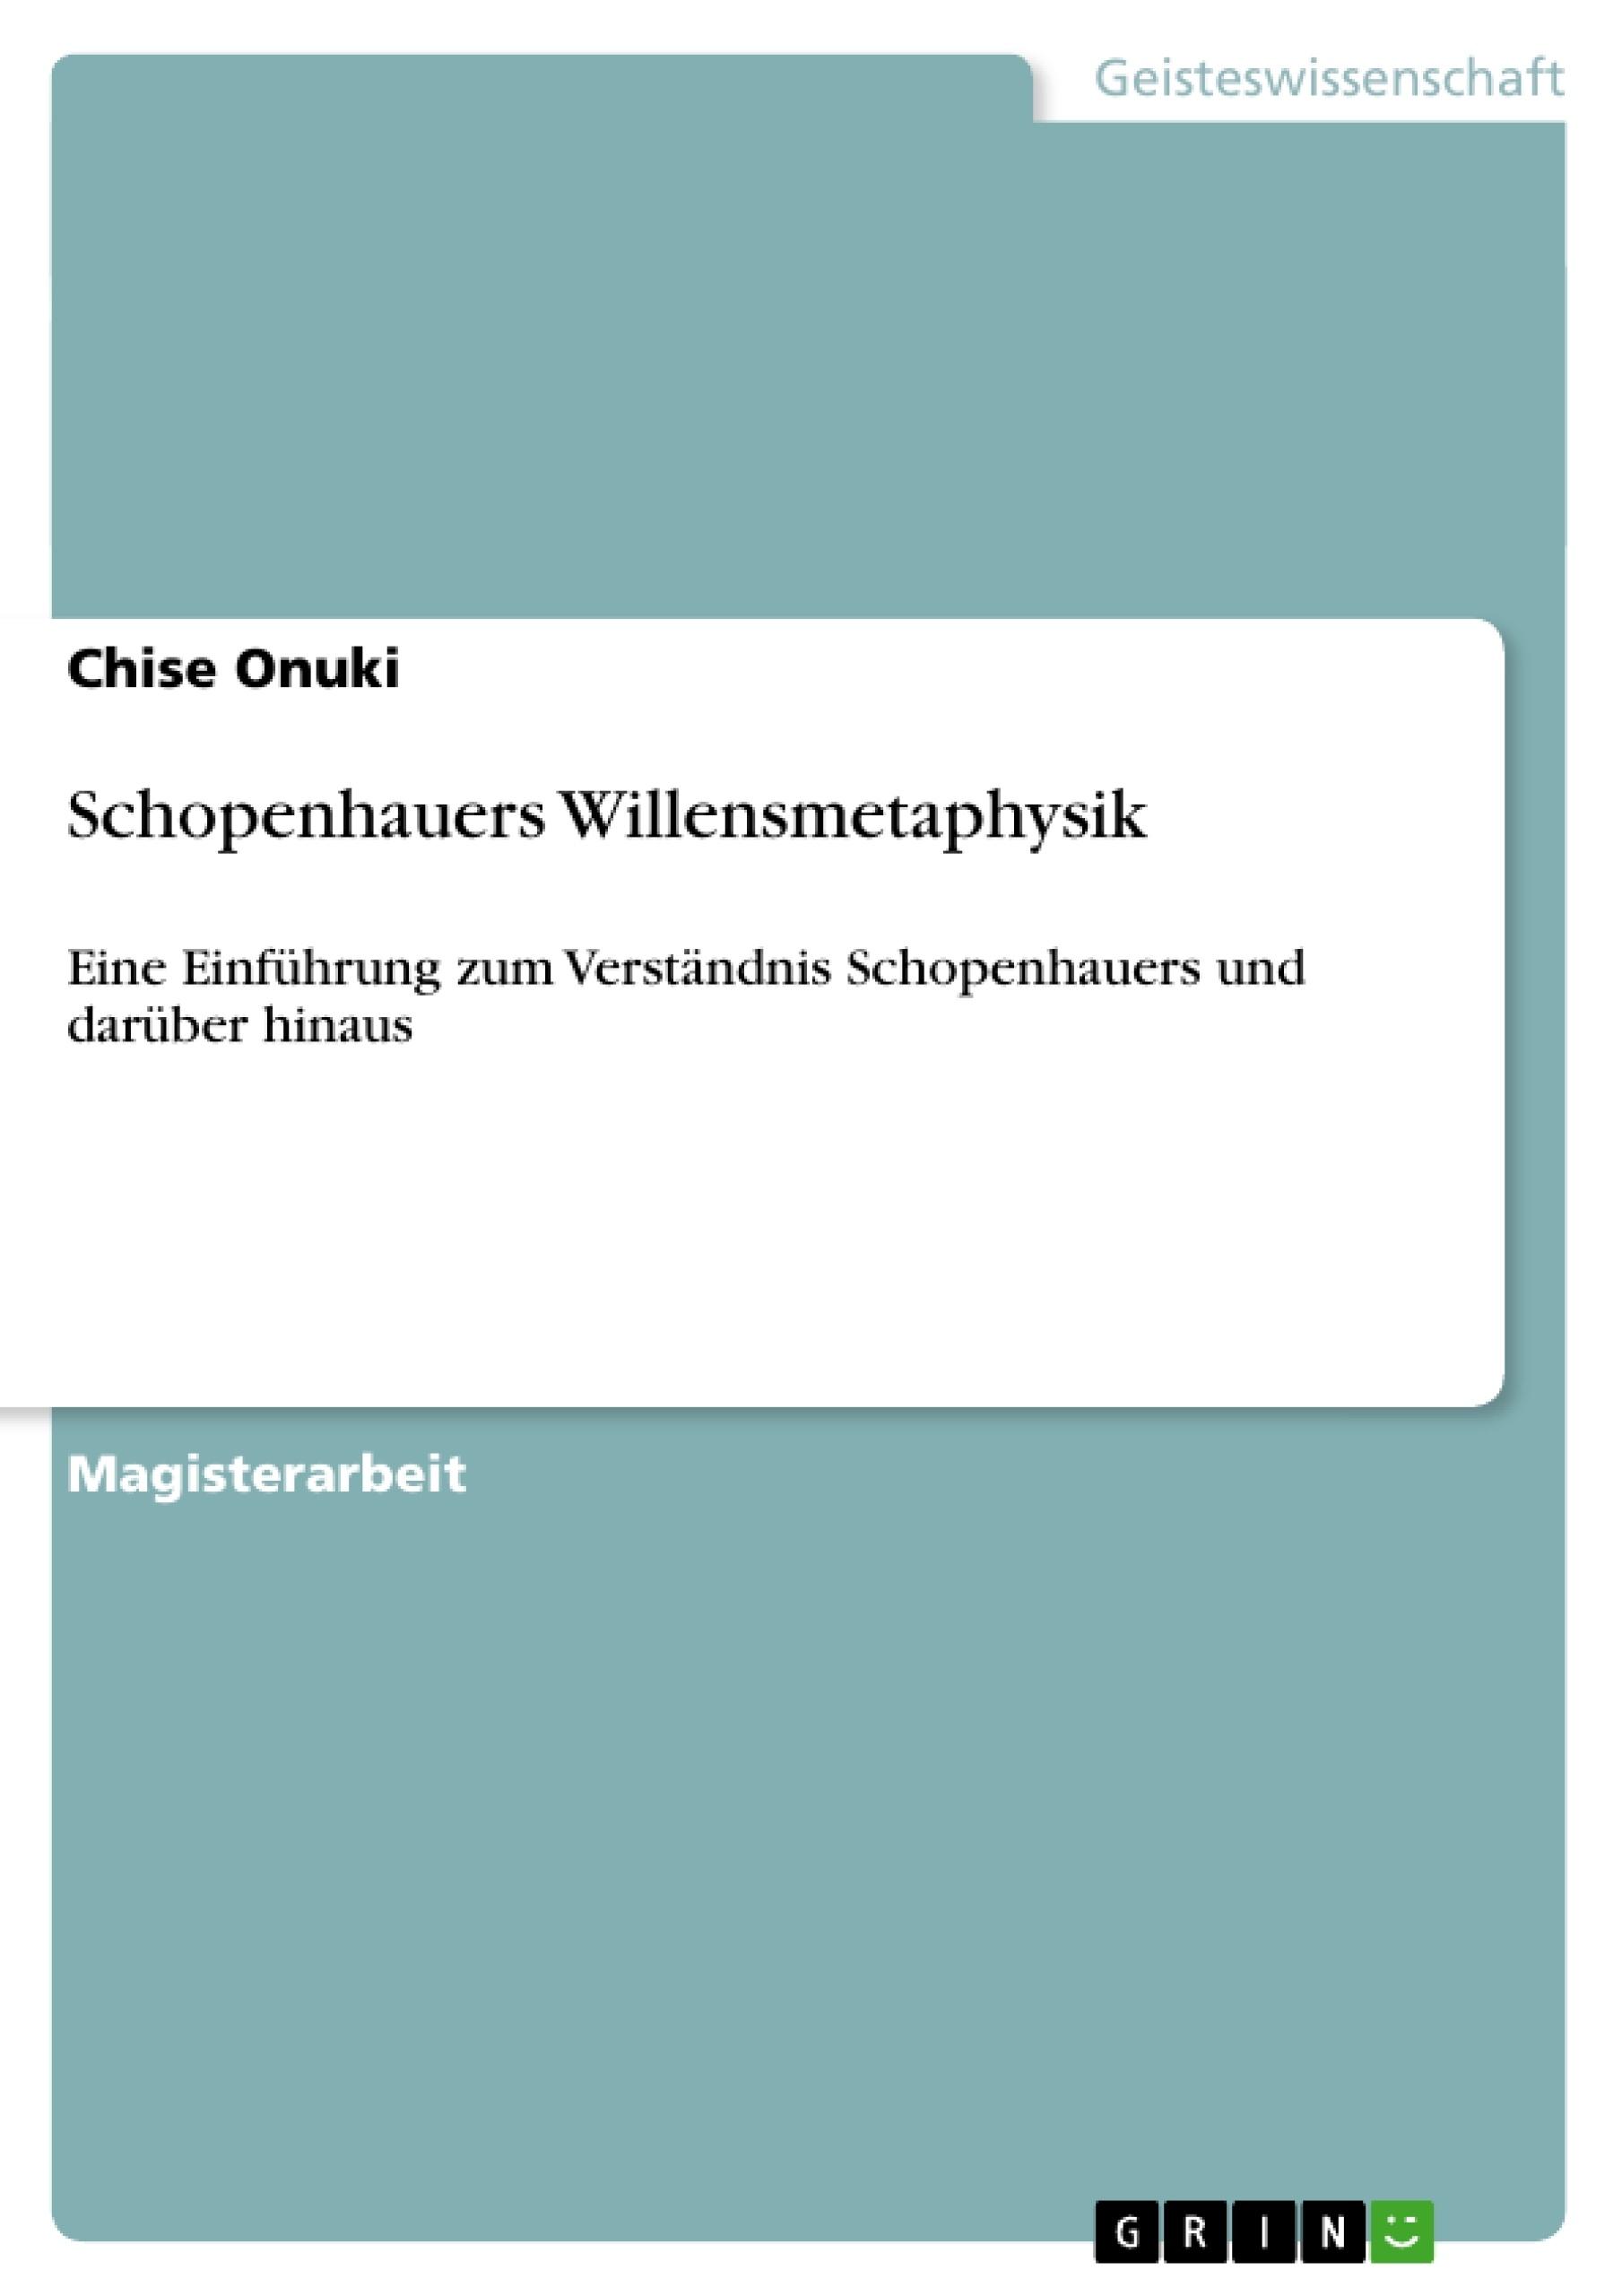 Titel: Schopenhauers Willensmetaphysik